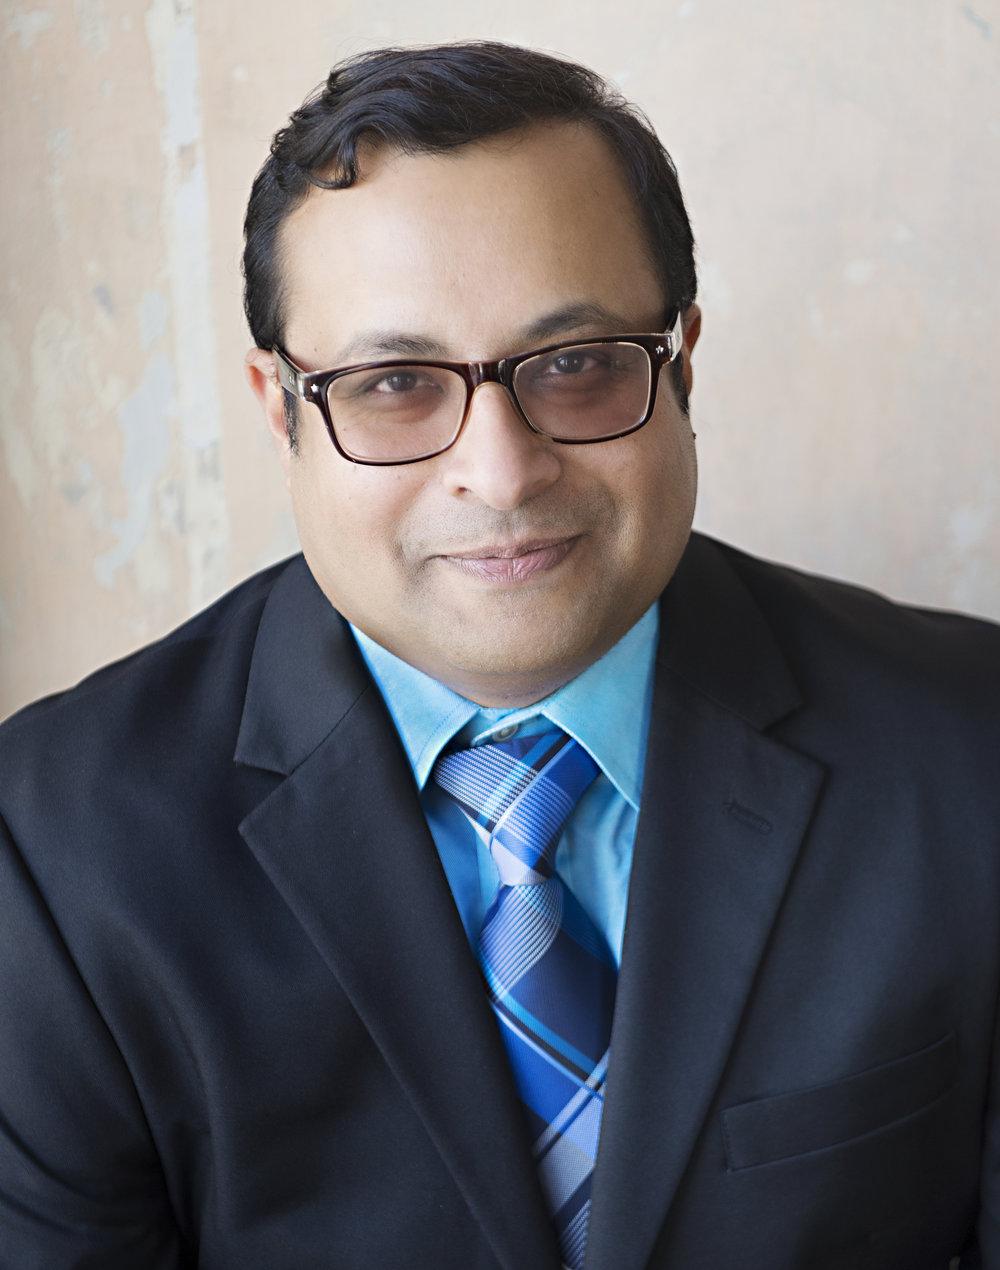 Swarn Chatterjee Ph.D.